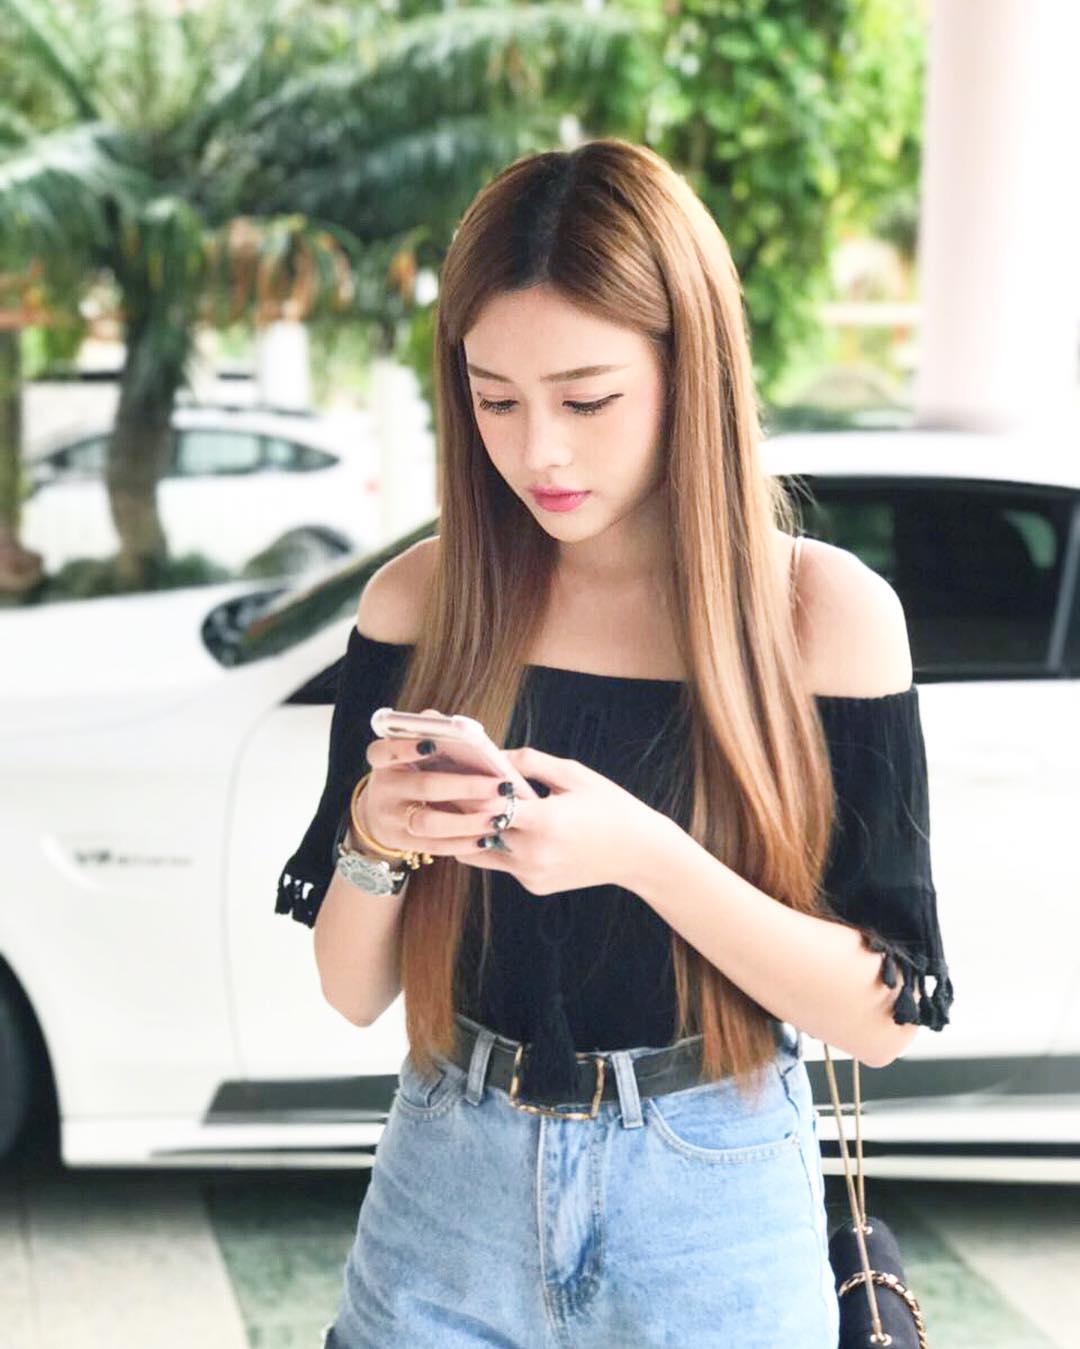 Han ξ AO (Wen Gy I) – Flower, Penang